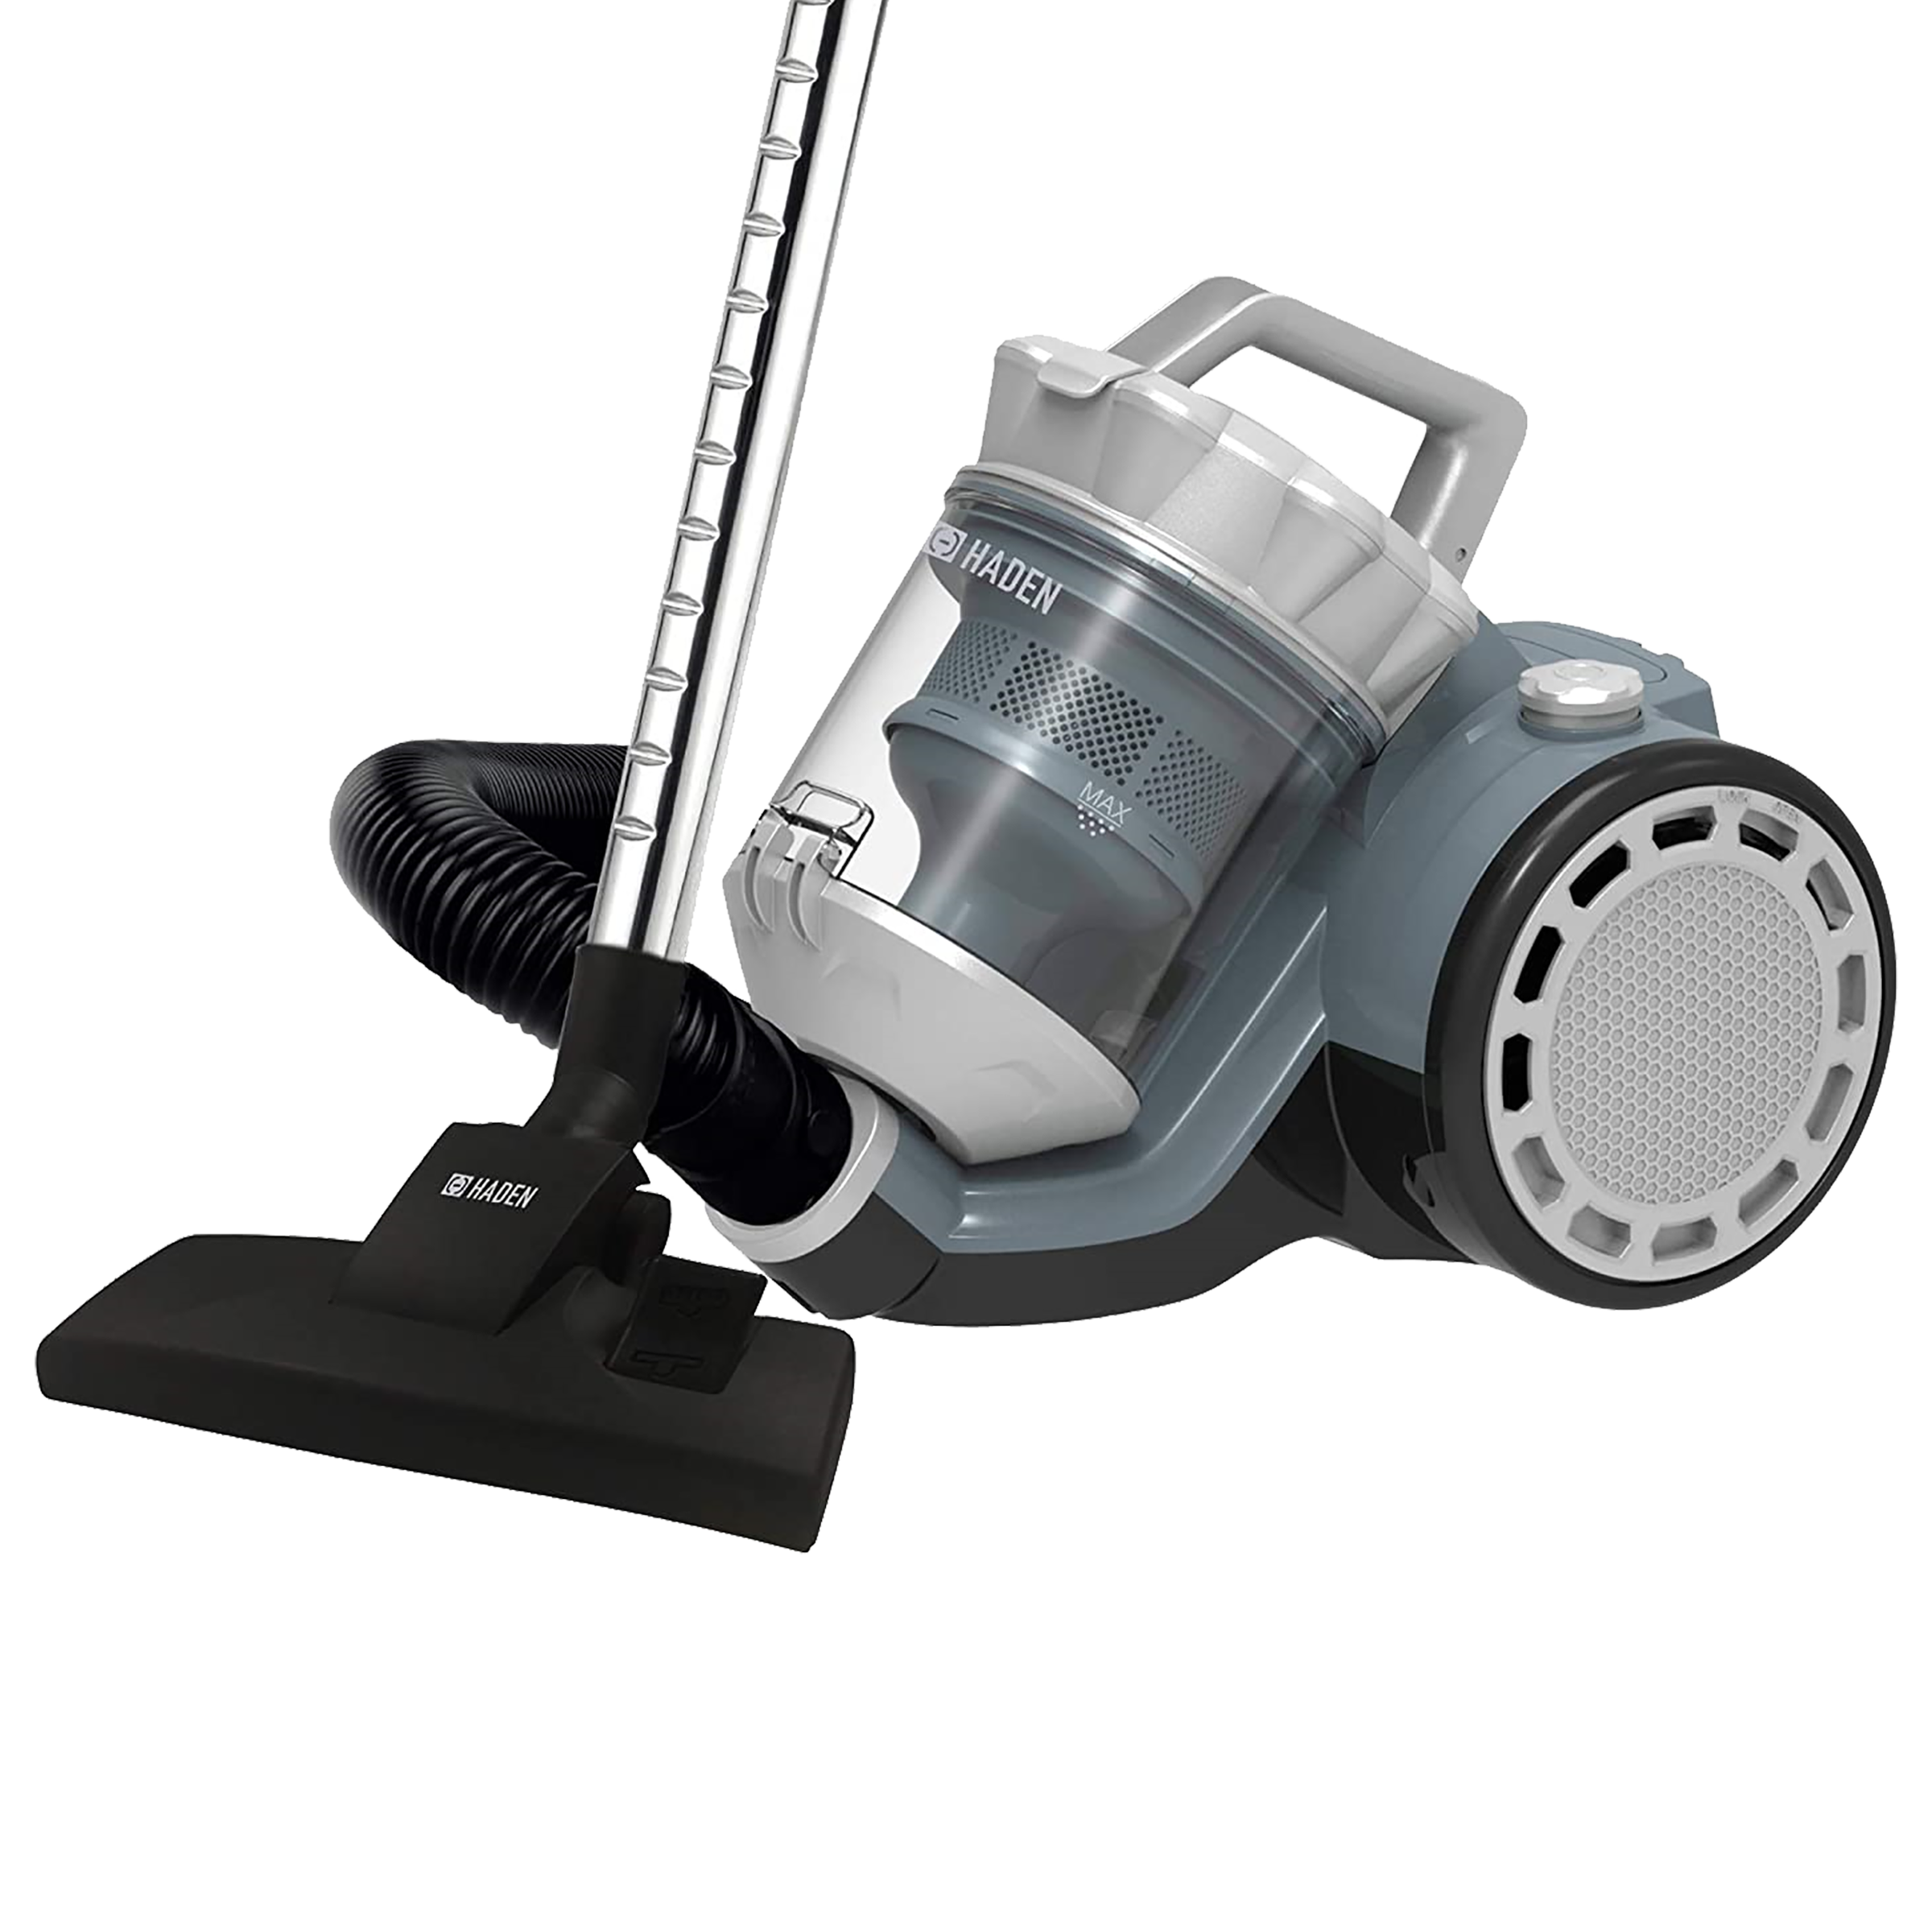 Sabichi 700 Watts Wet & Dry Vacuum Cleaner (2.5 Litres Tank, 195272, Black)_1